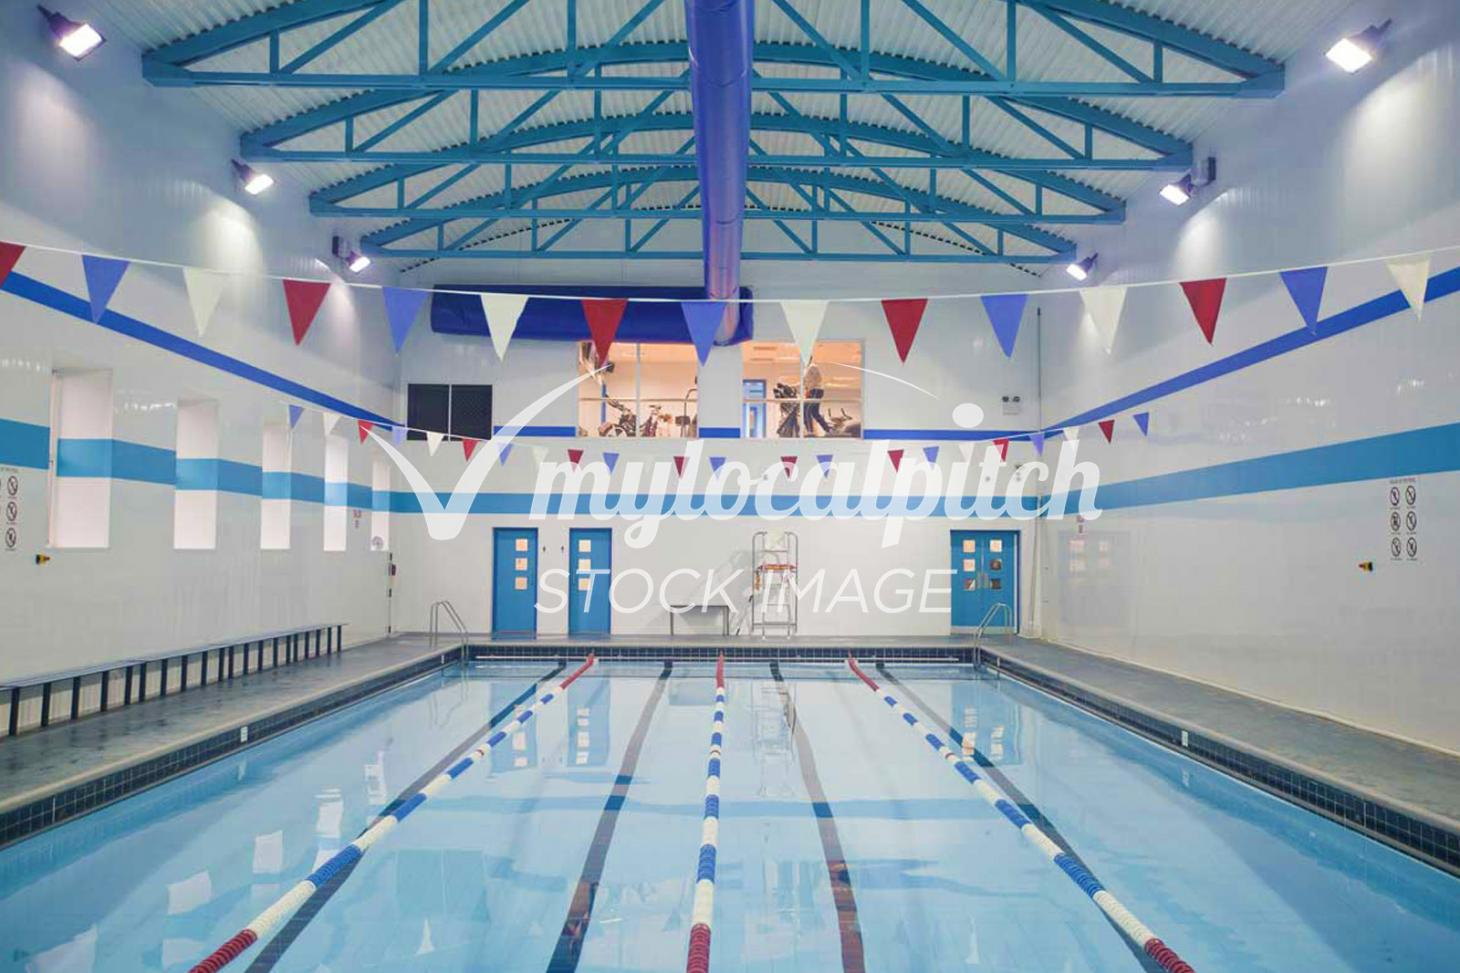 Kensington Leisure Centre Indoor swimming pool